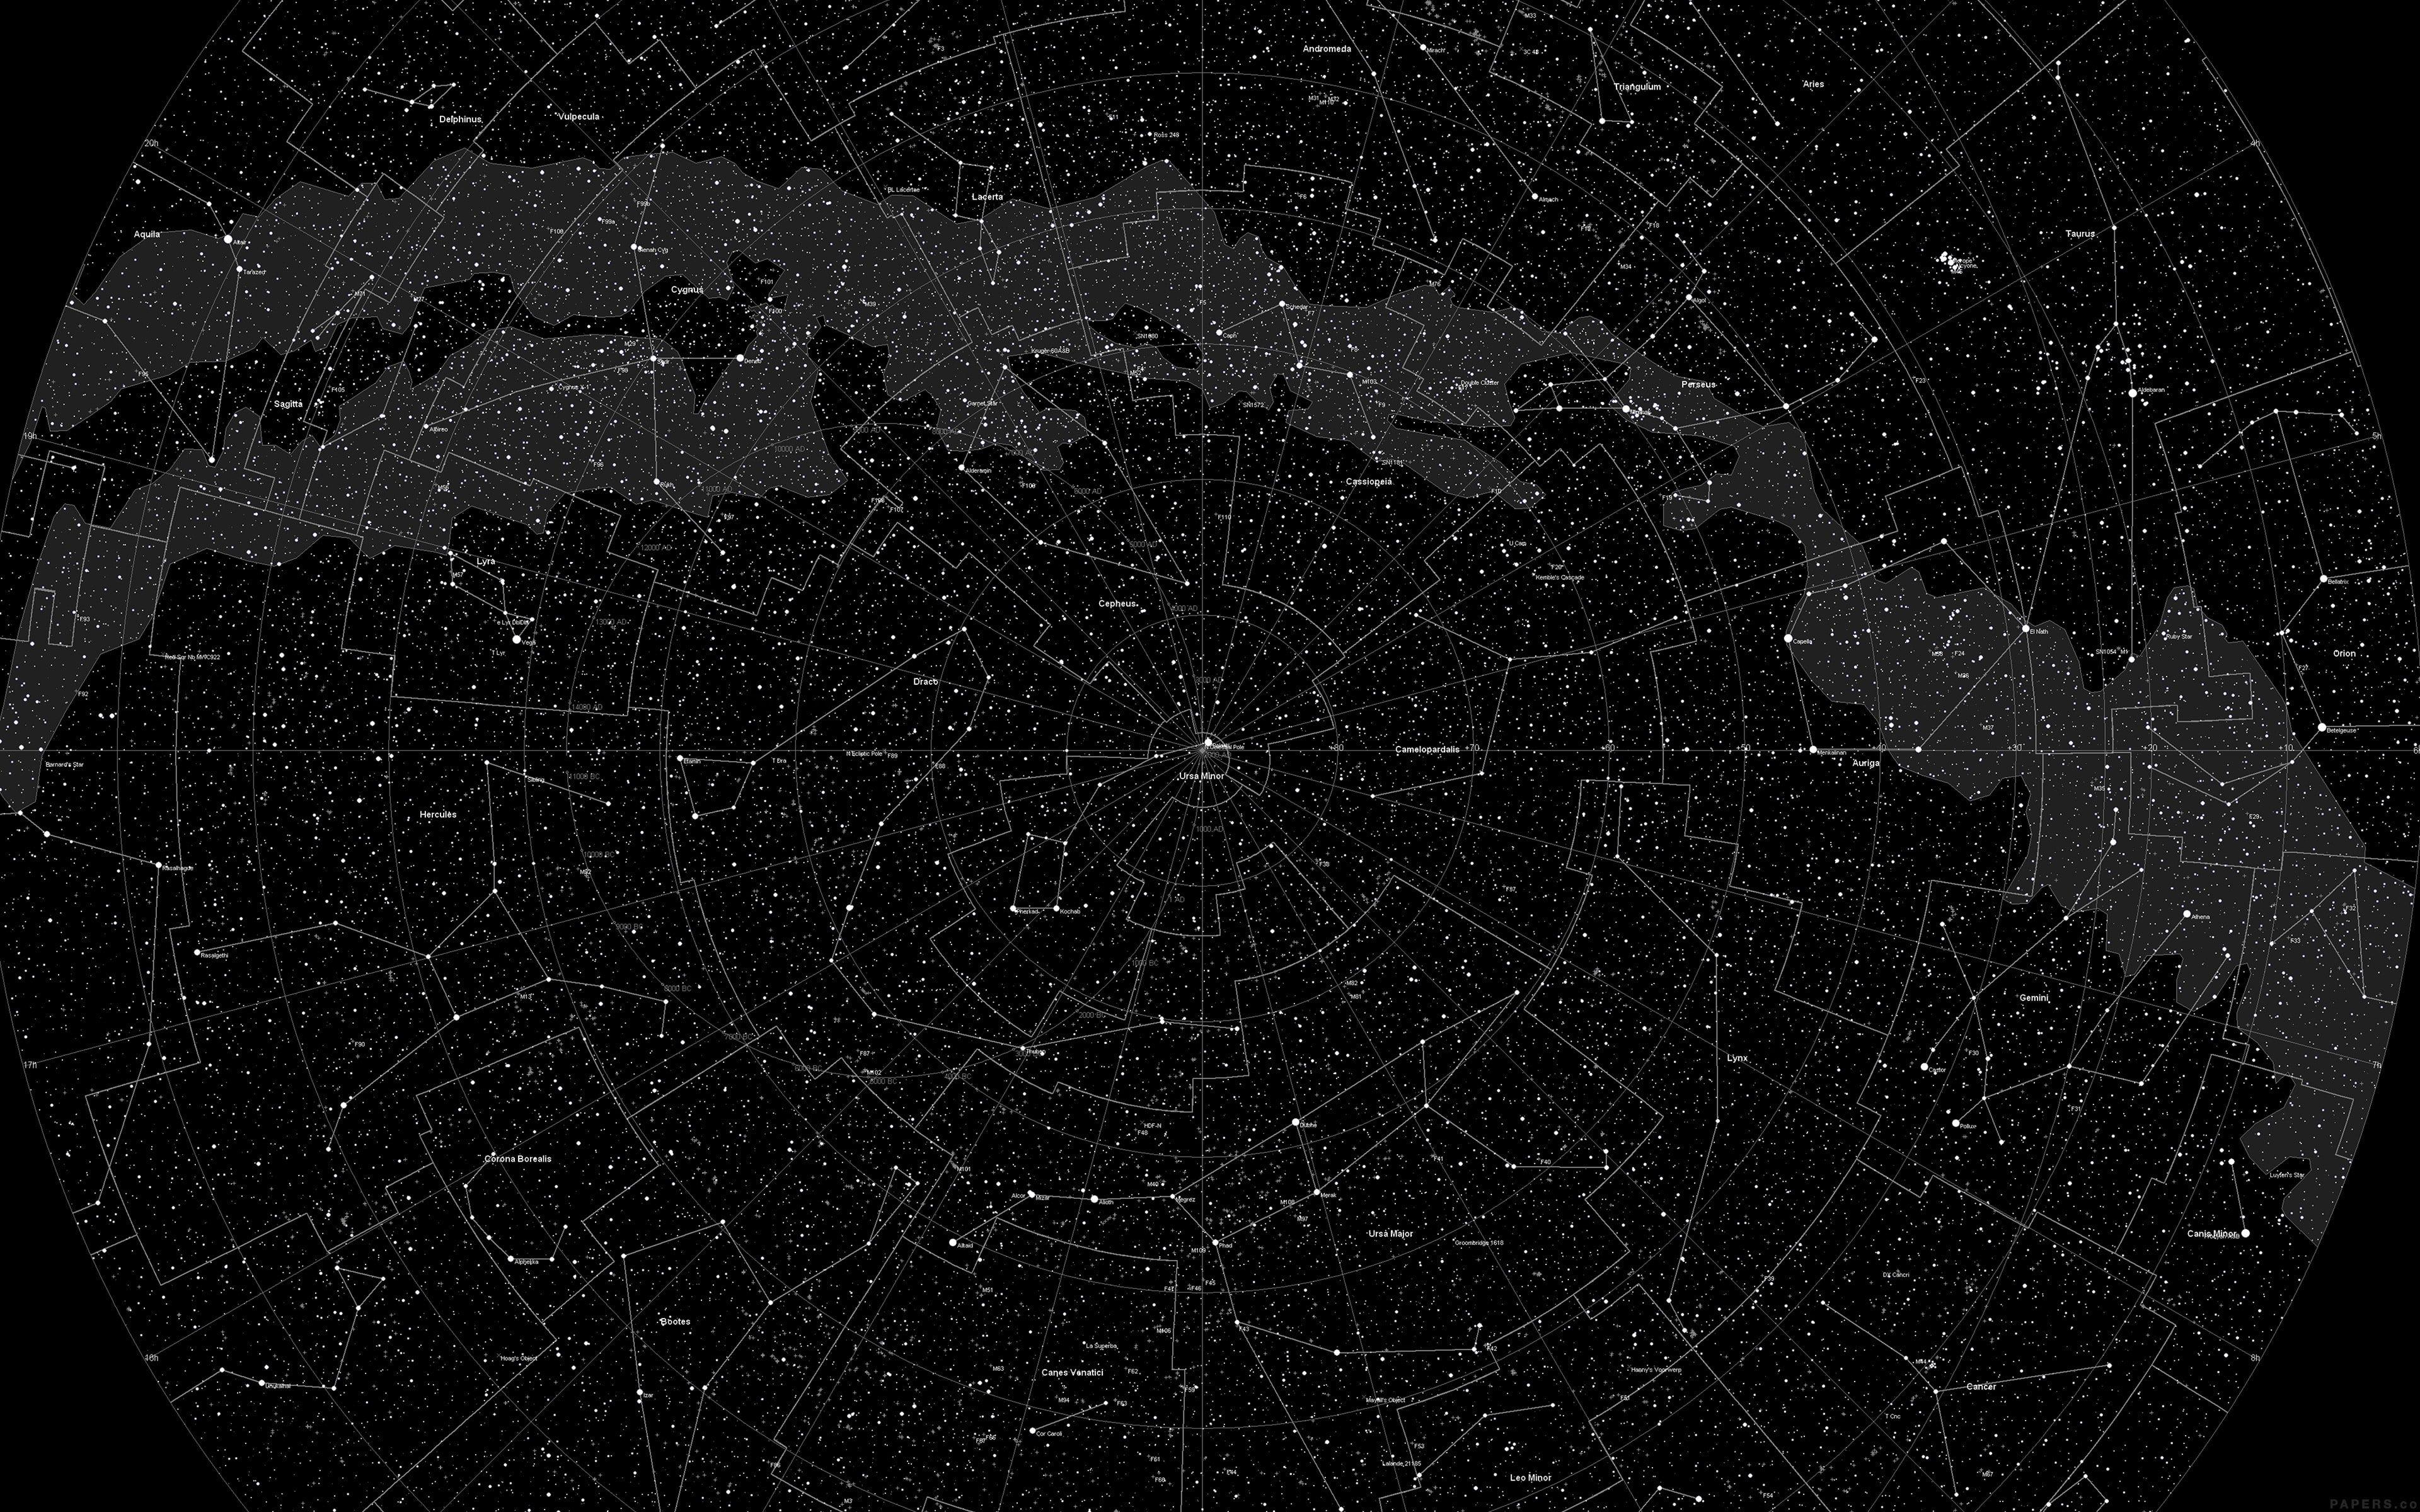 Space Star Map Pattern Dark 4k Wallpaper Hdwallpa In 2020 Laptop Wallpaper Desktop Wallpapers Computer Wallpaper Desktop Wallpapers Aesthetic Desktop Wallpaper